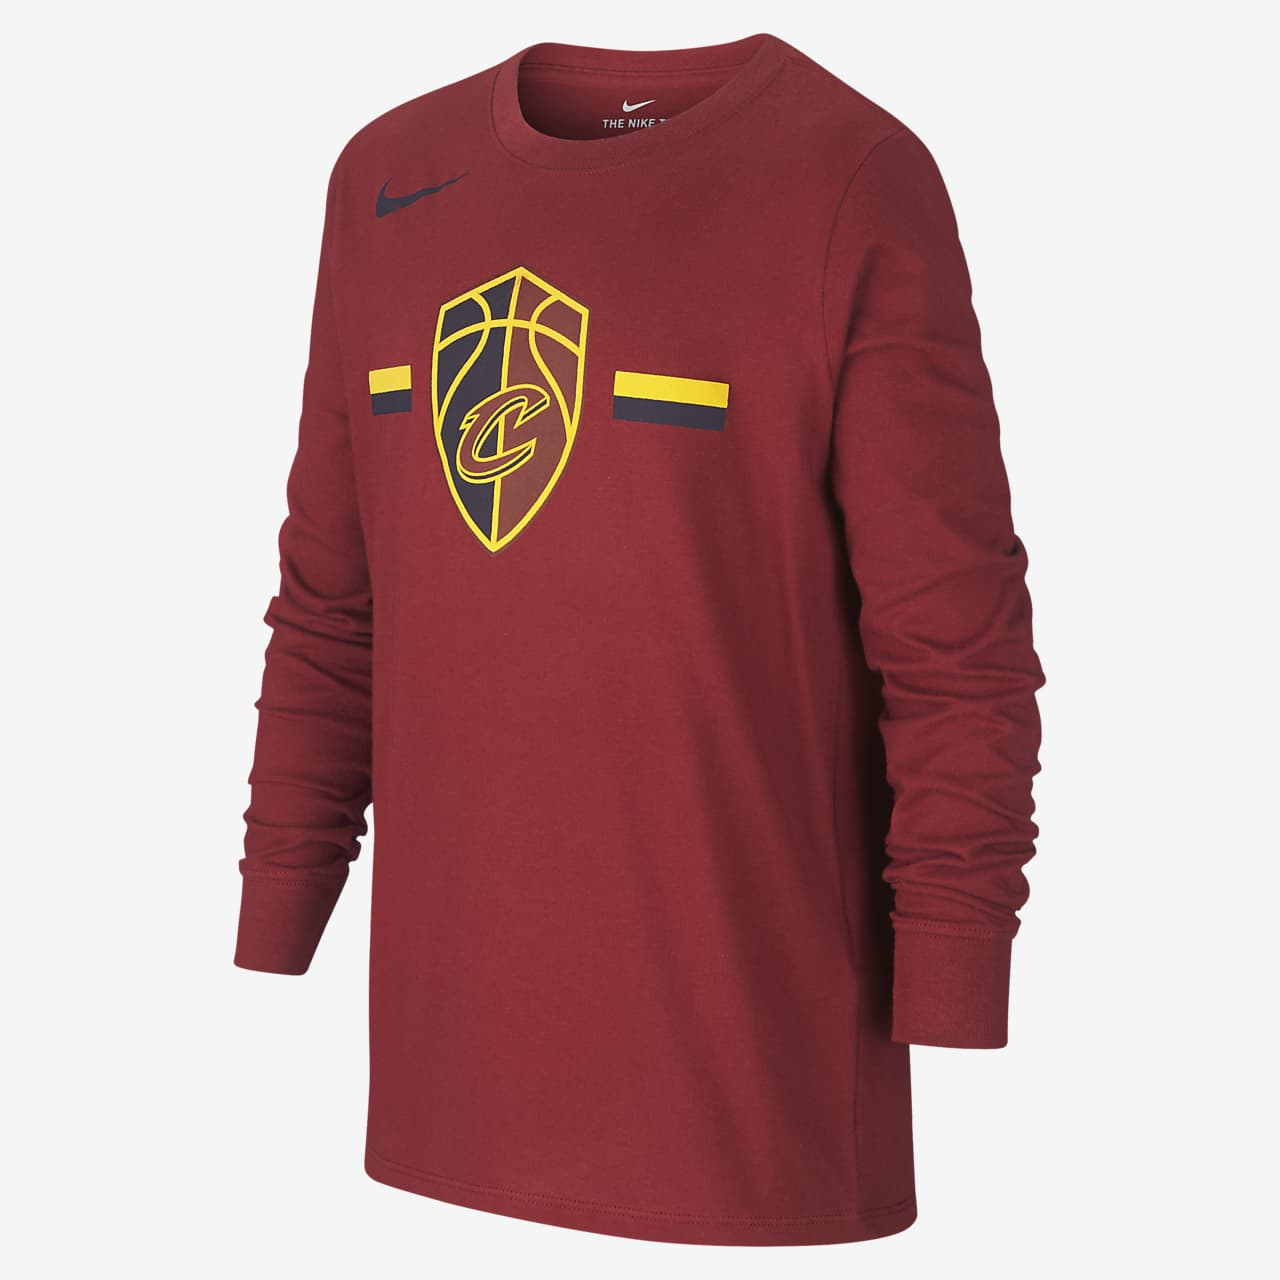 Cleveland Cavaliers Nike Dri-FIT Logo Older Kids' Long-Sleeve NBA T-Shirt